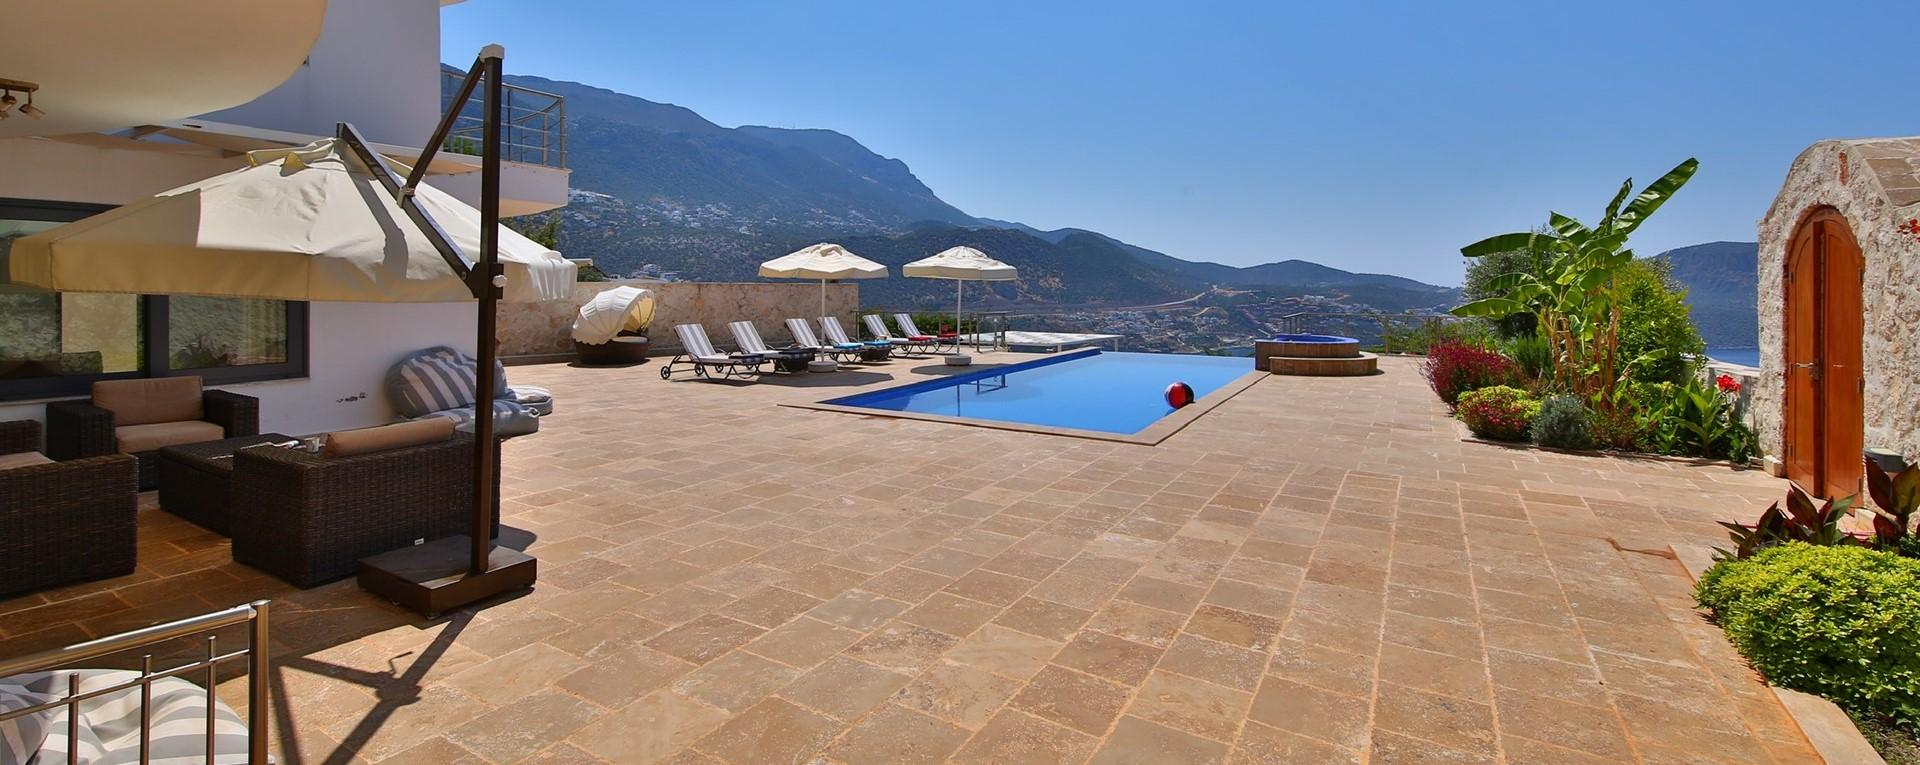 5-bedroom-luxury-pool-villa-kalkan